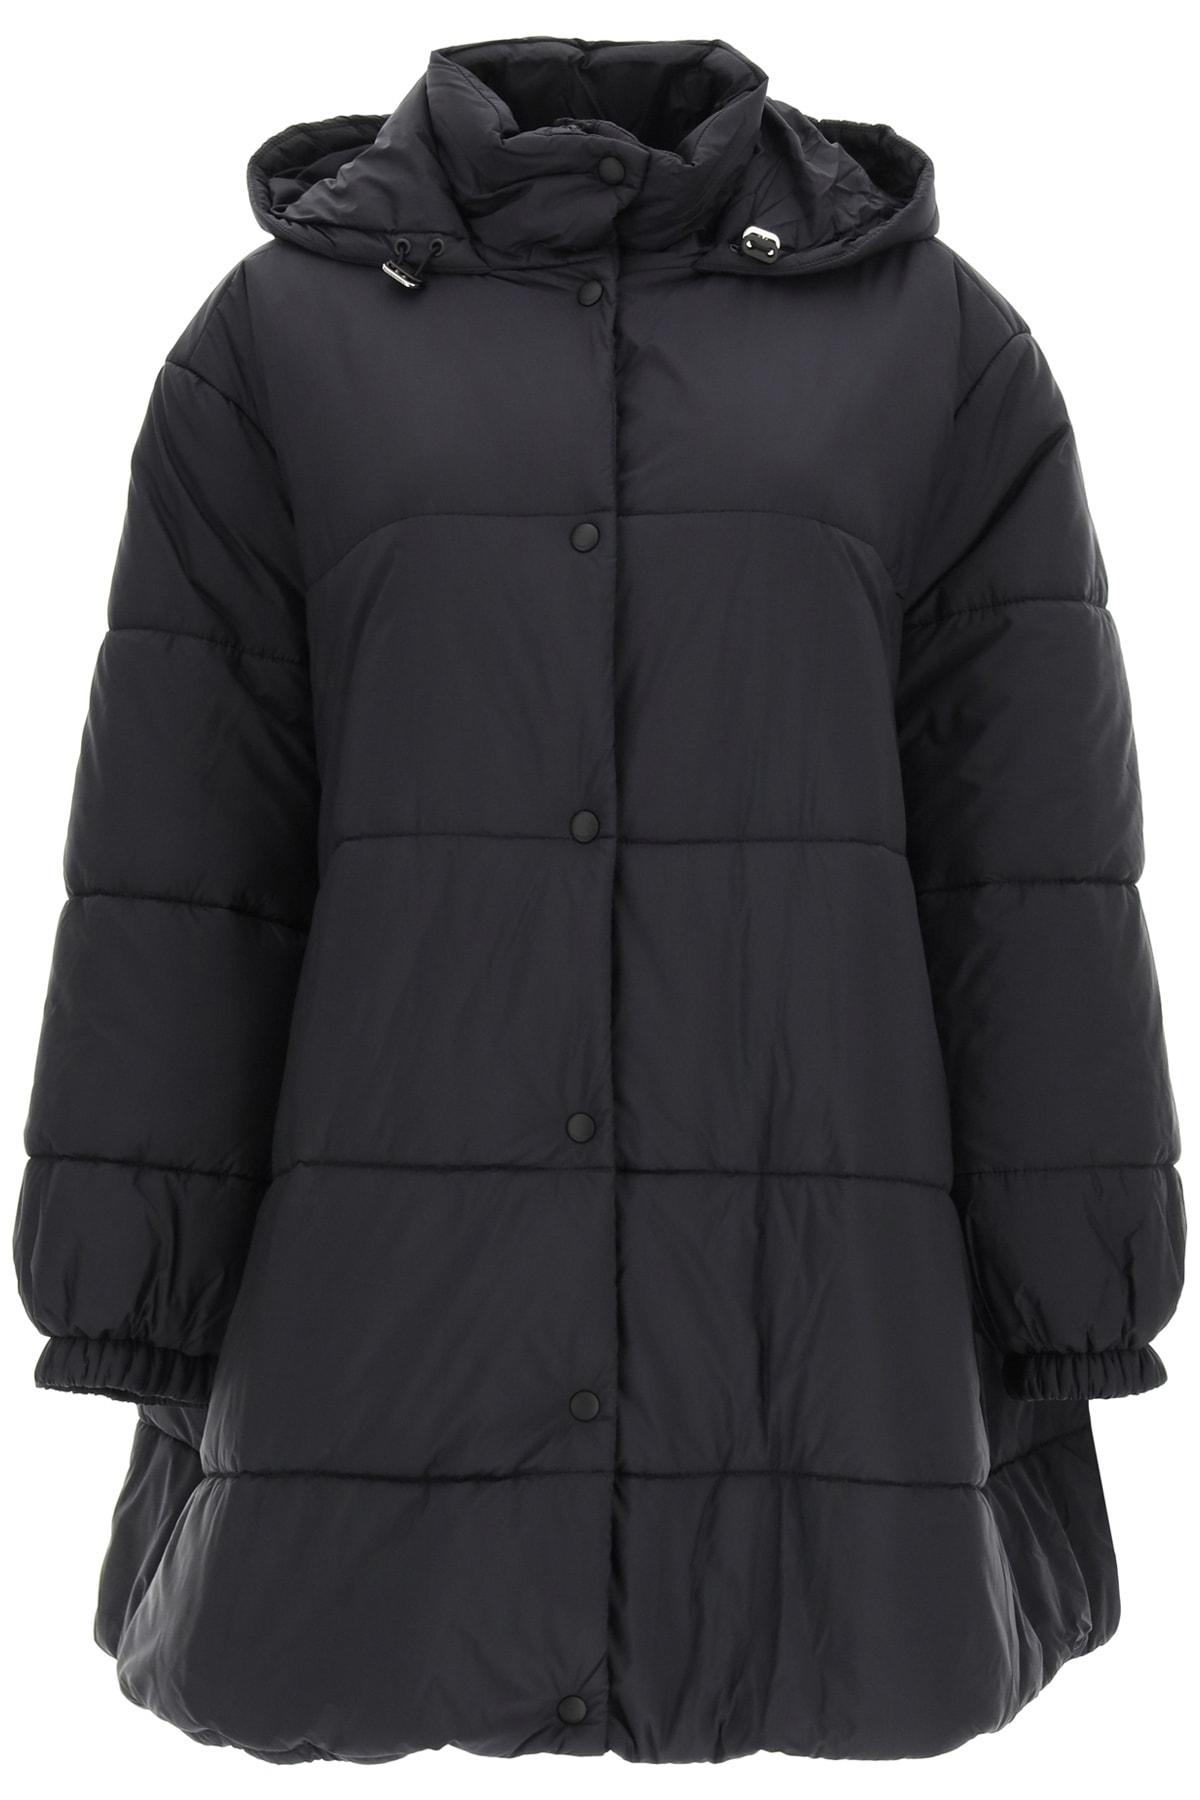 Givenchy Jackets OVERSIZED LONG DOWN JACKET